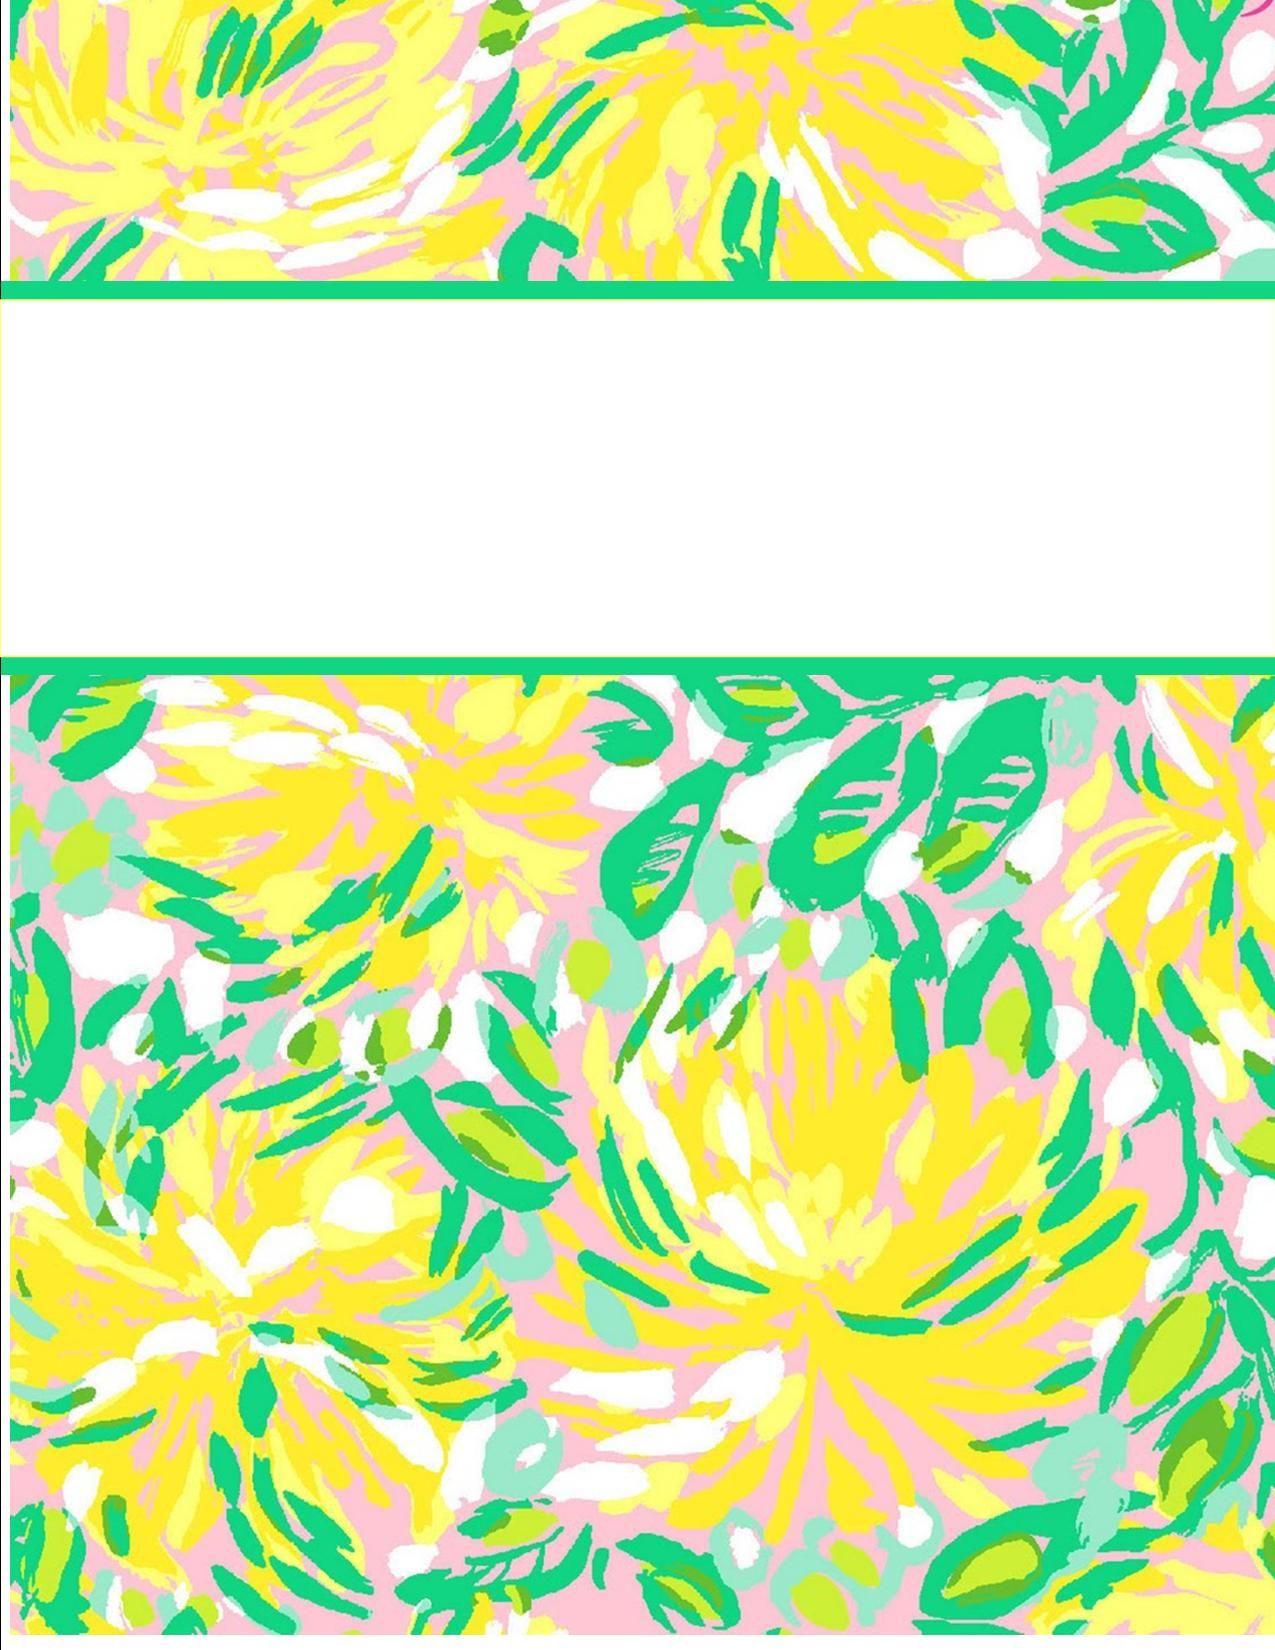 My Cute Binder Covers | Textur